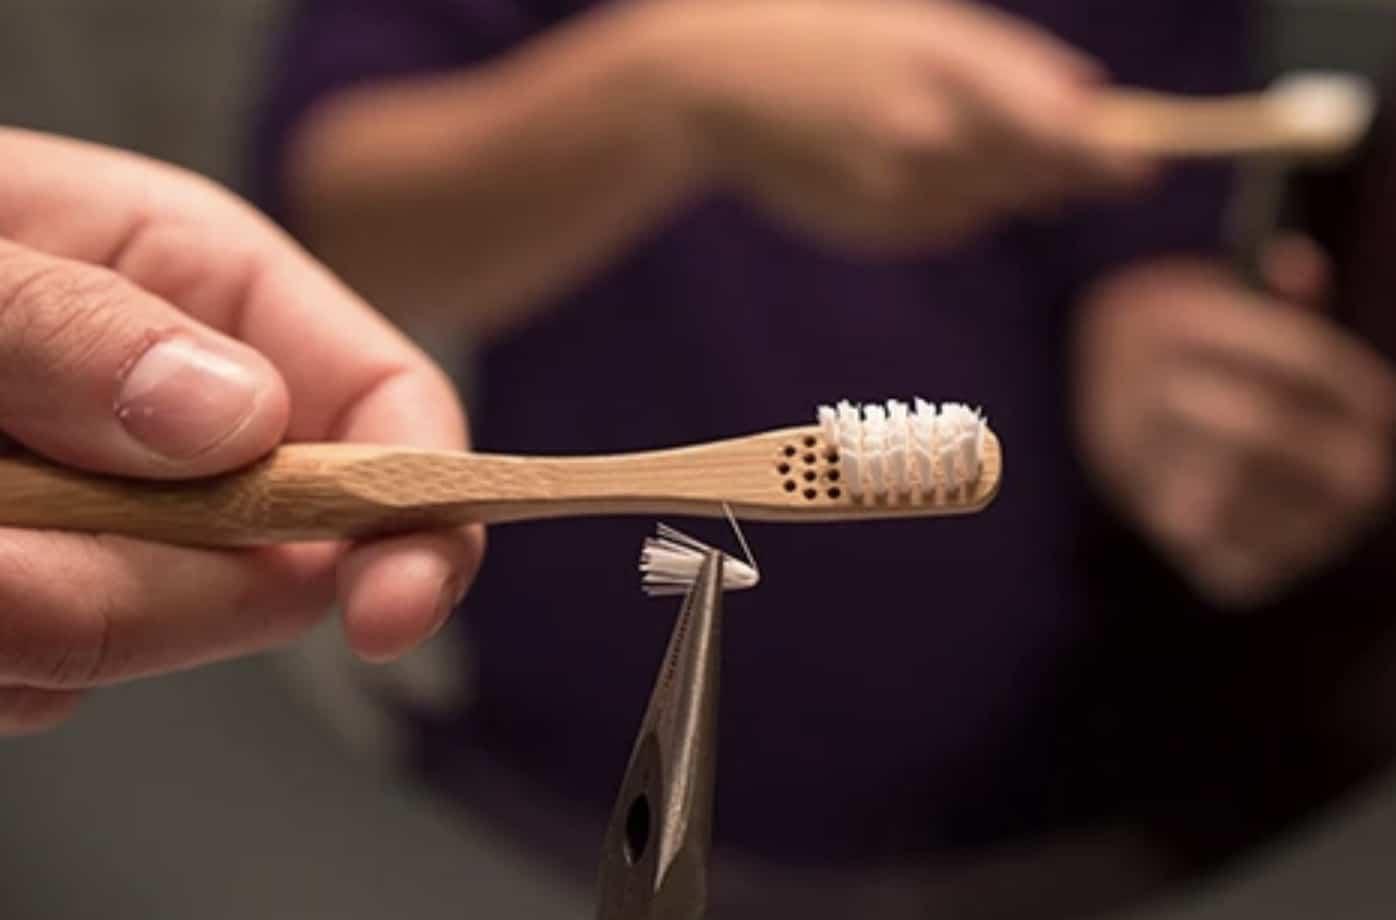 Removing the Bristles